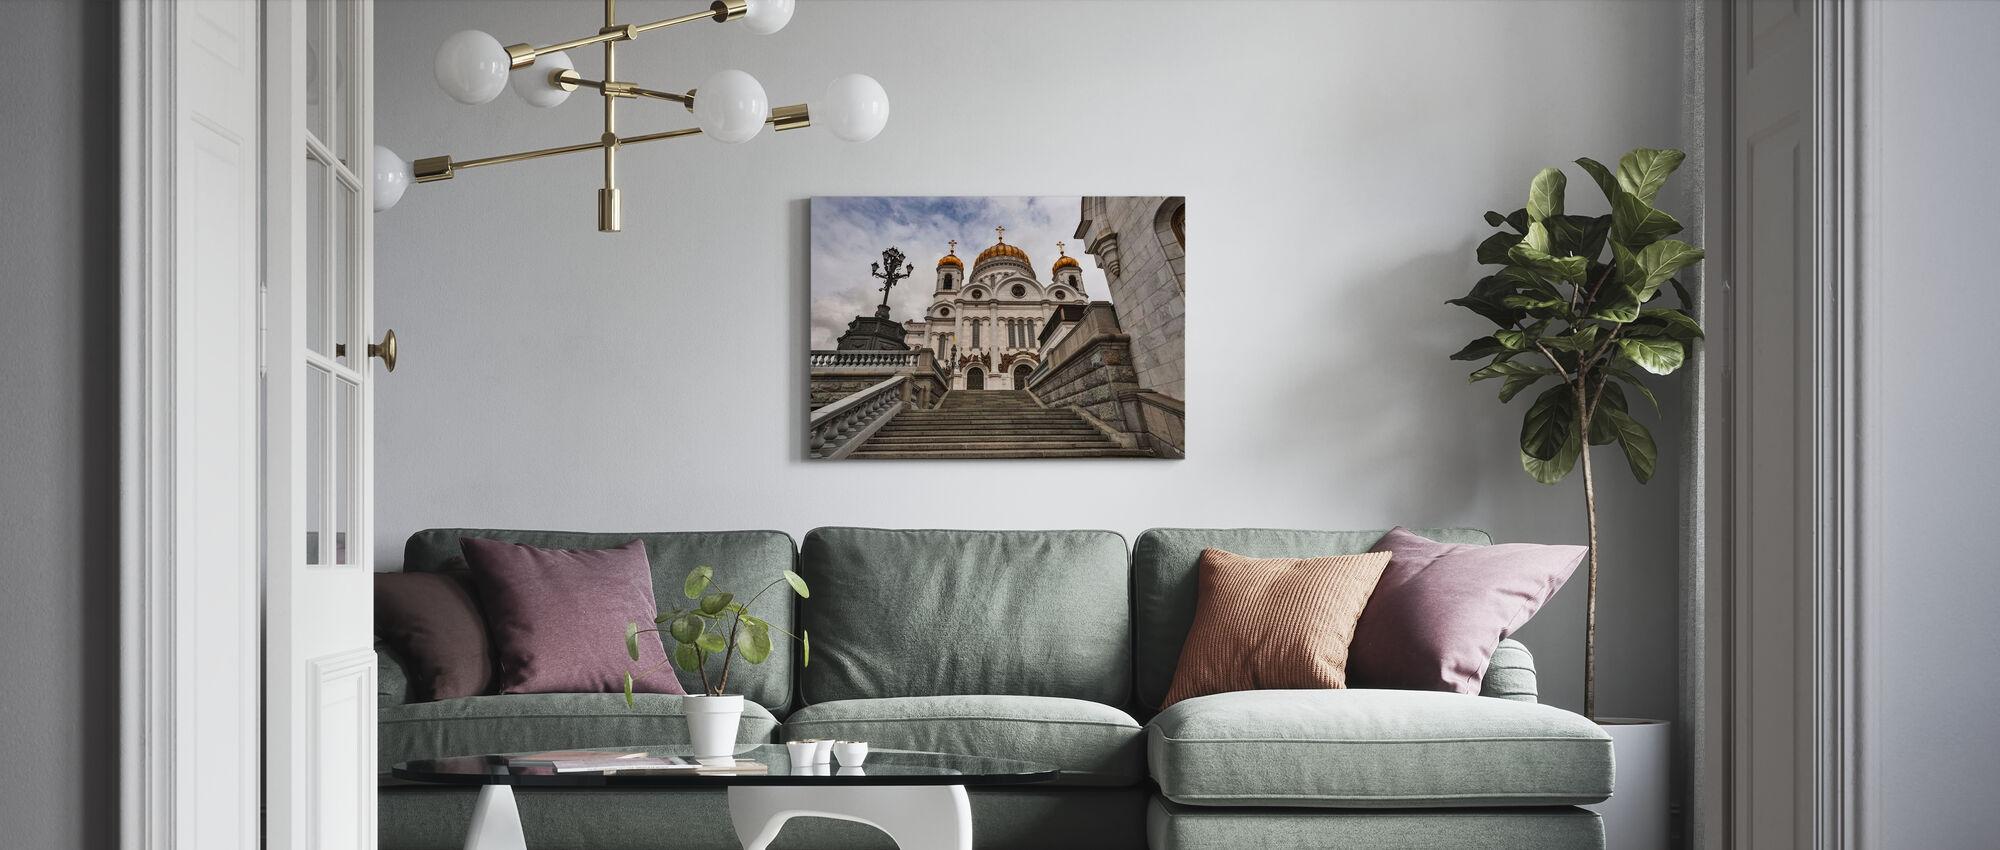 Foran Kristi katedral Frelseren - Lerretsbilde - Stue